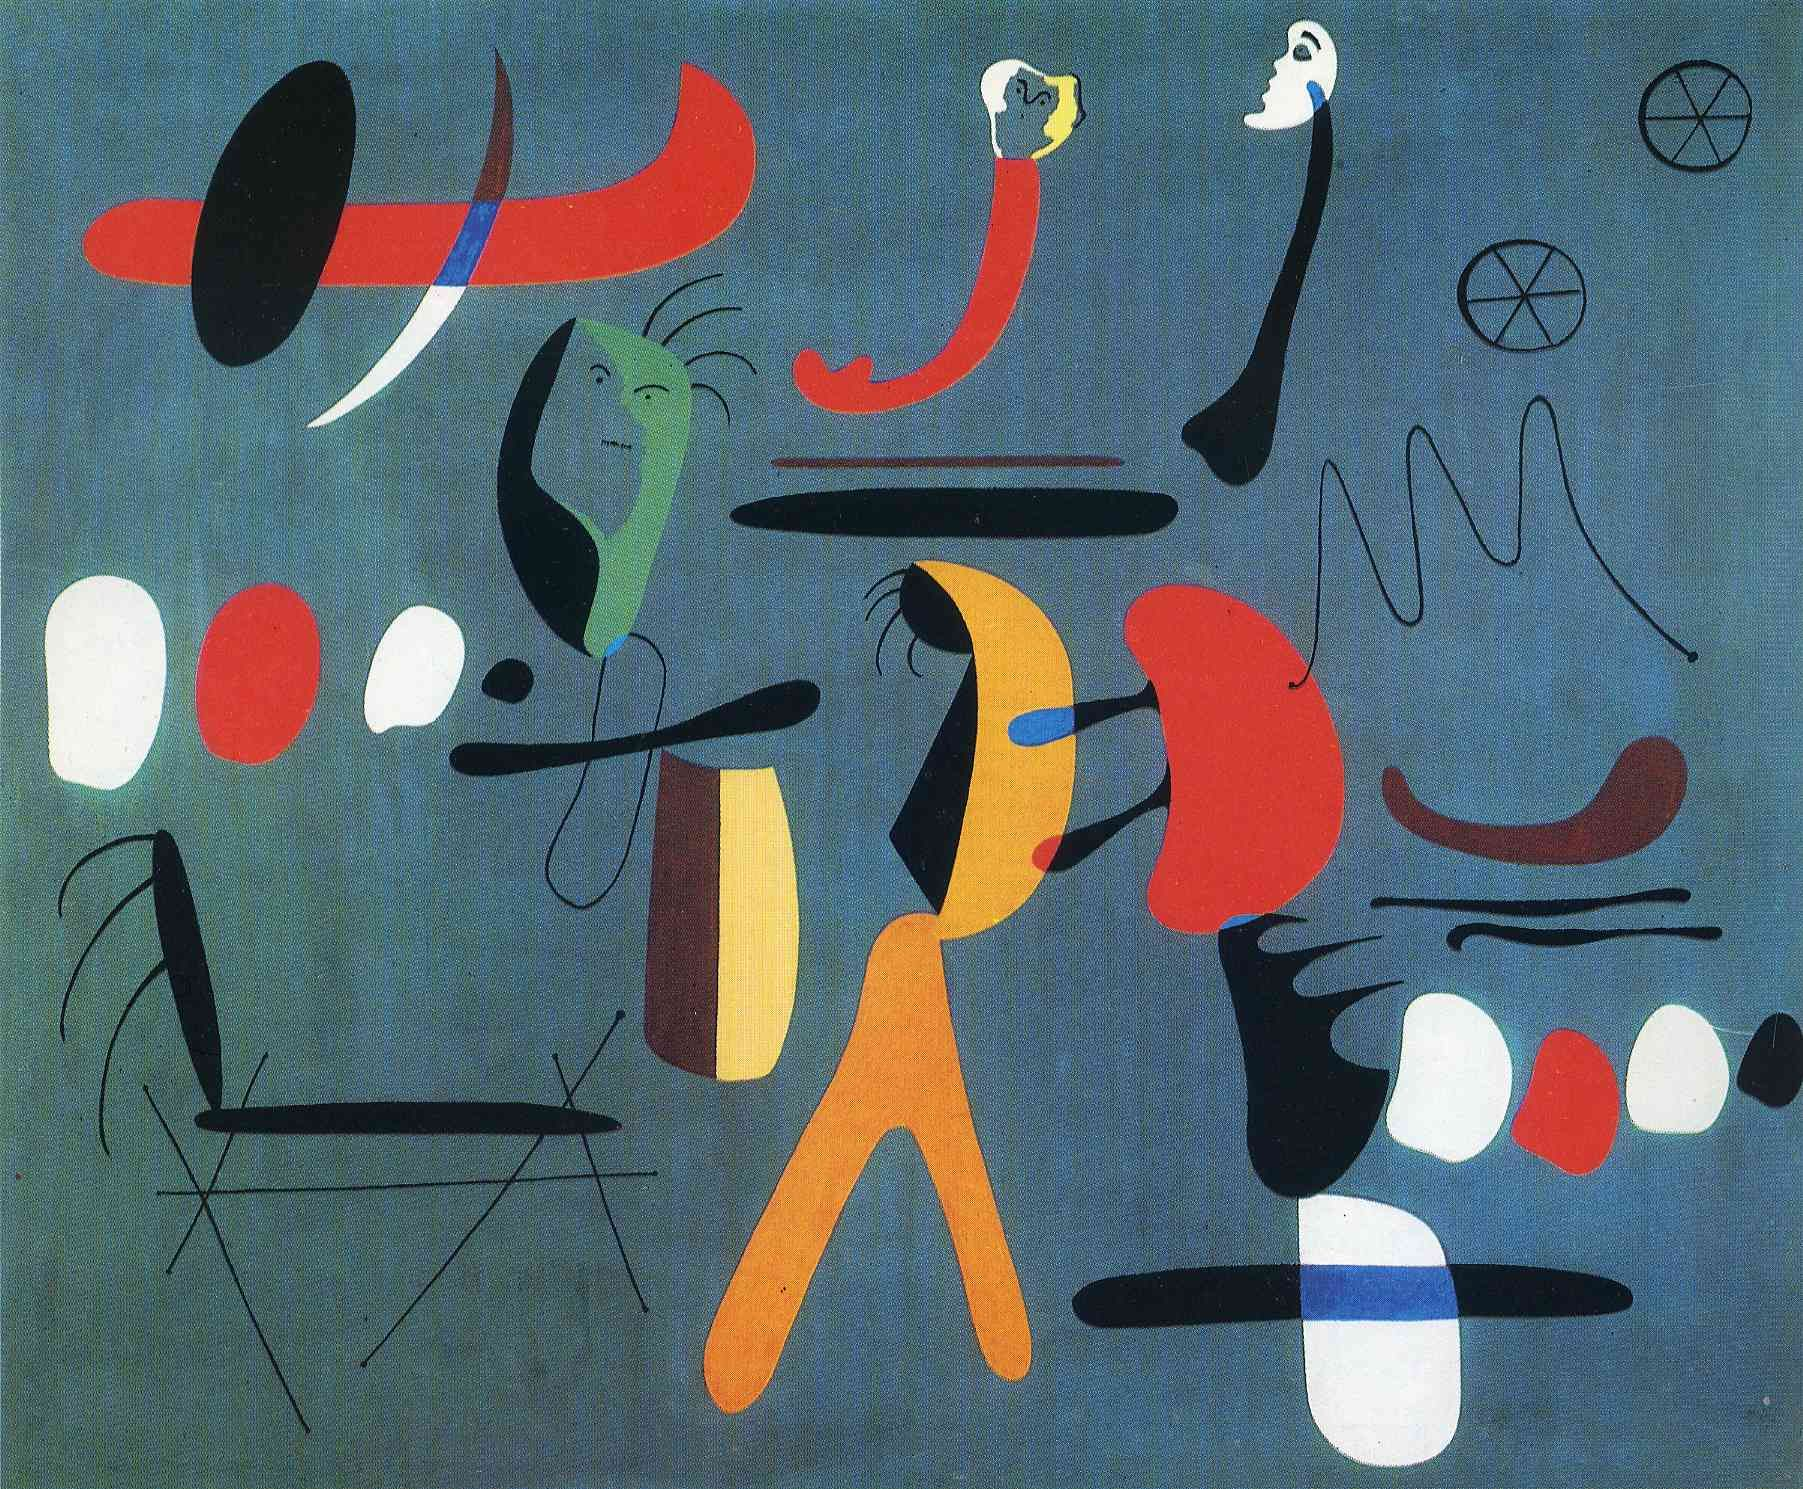 joan miro paintings   Painting - Joan Miro - WikiPaintings.org ...